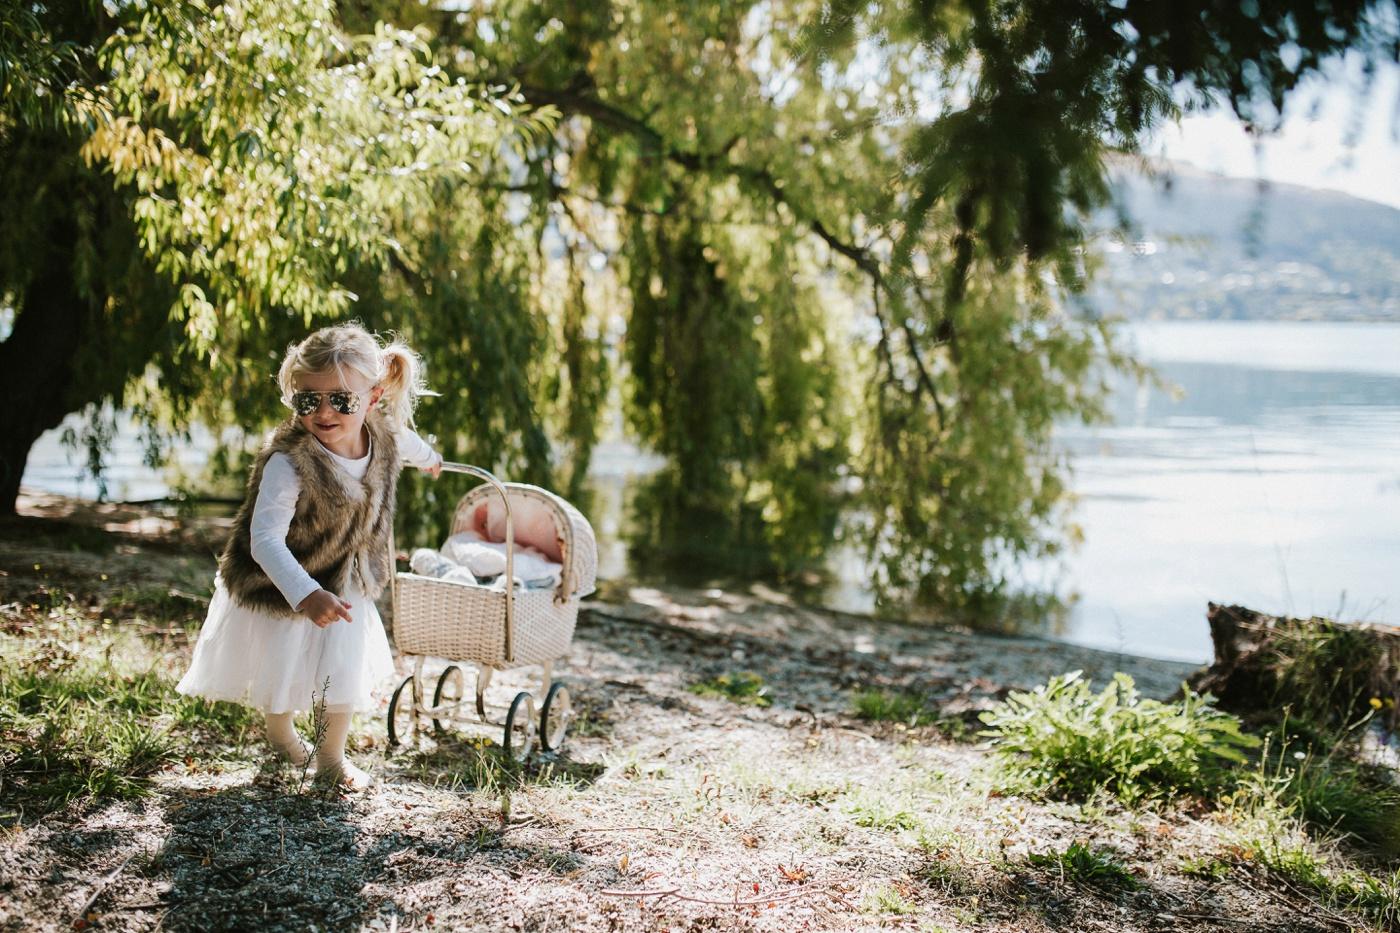 Blake-Lily-Rolig-Lekfull-Familjesession-Familjefotograf-Stockholm-Orebro_15